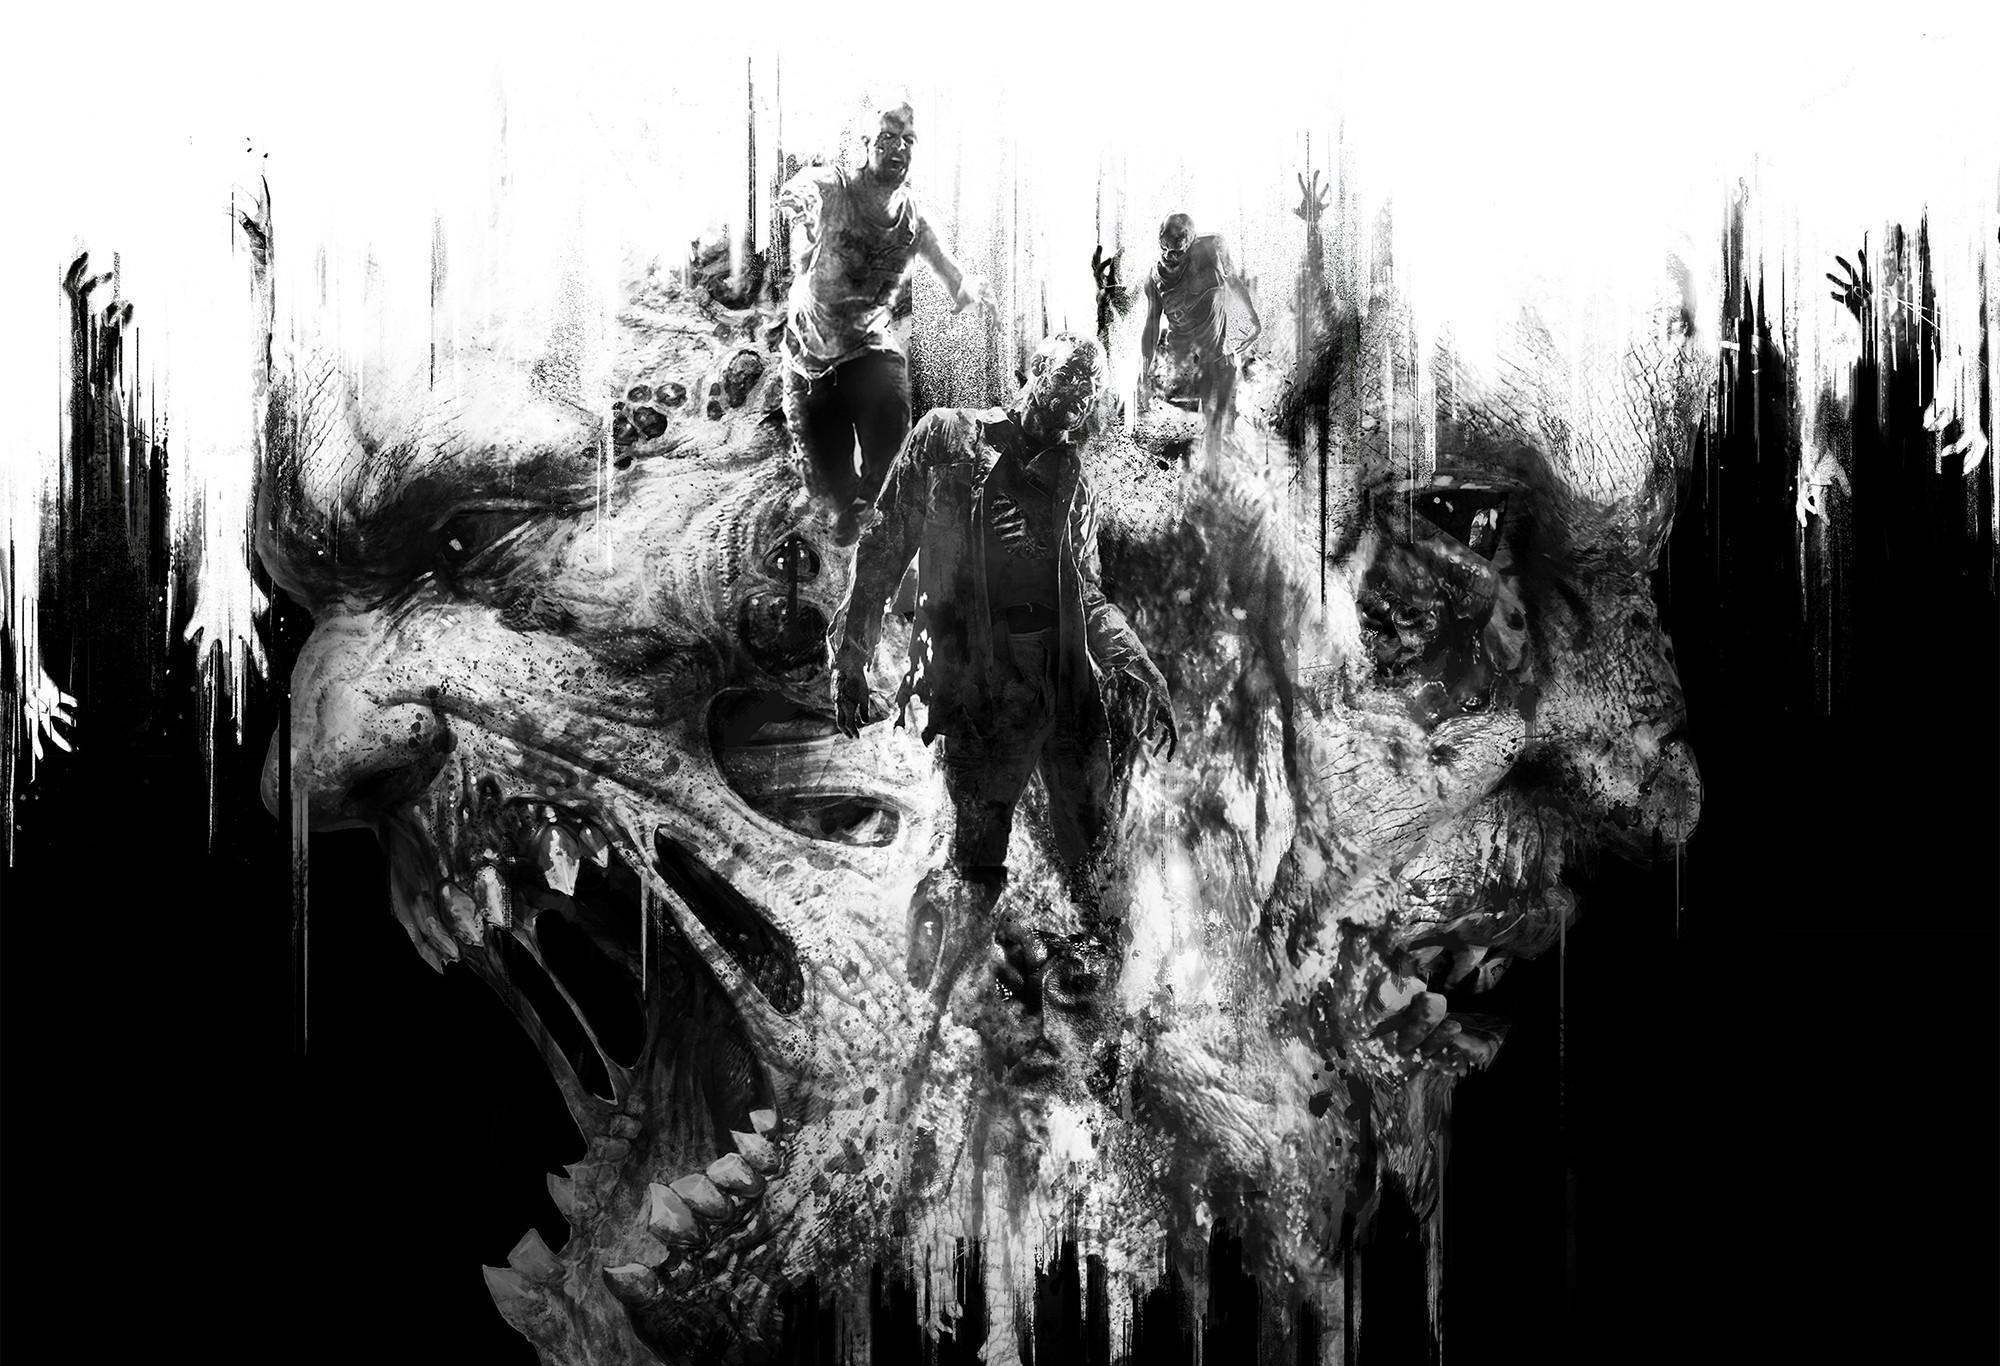 Zombie wallpaper download free stunning backgrounds for desktop 2000x1366 hd wallpaper background id695673 download voltagebd Images